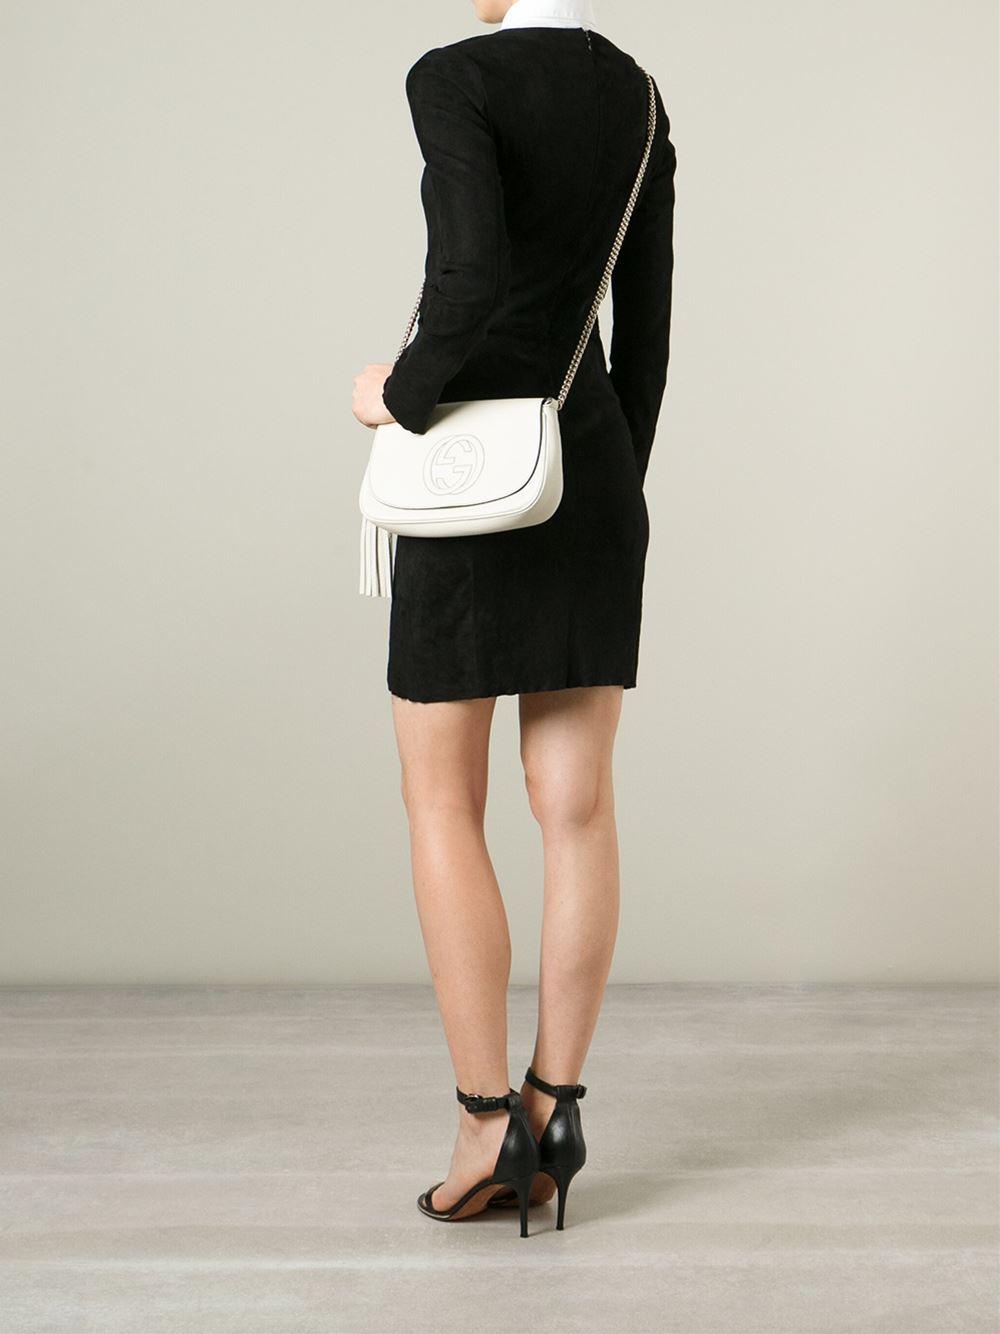 68533e209708 Gallery. Previously sold at: Farfetch · Women's Gucci Soho Bag